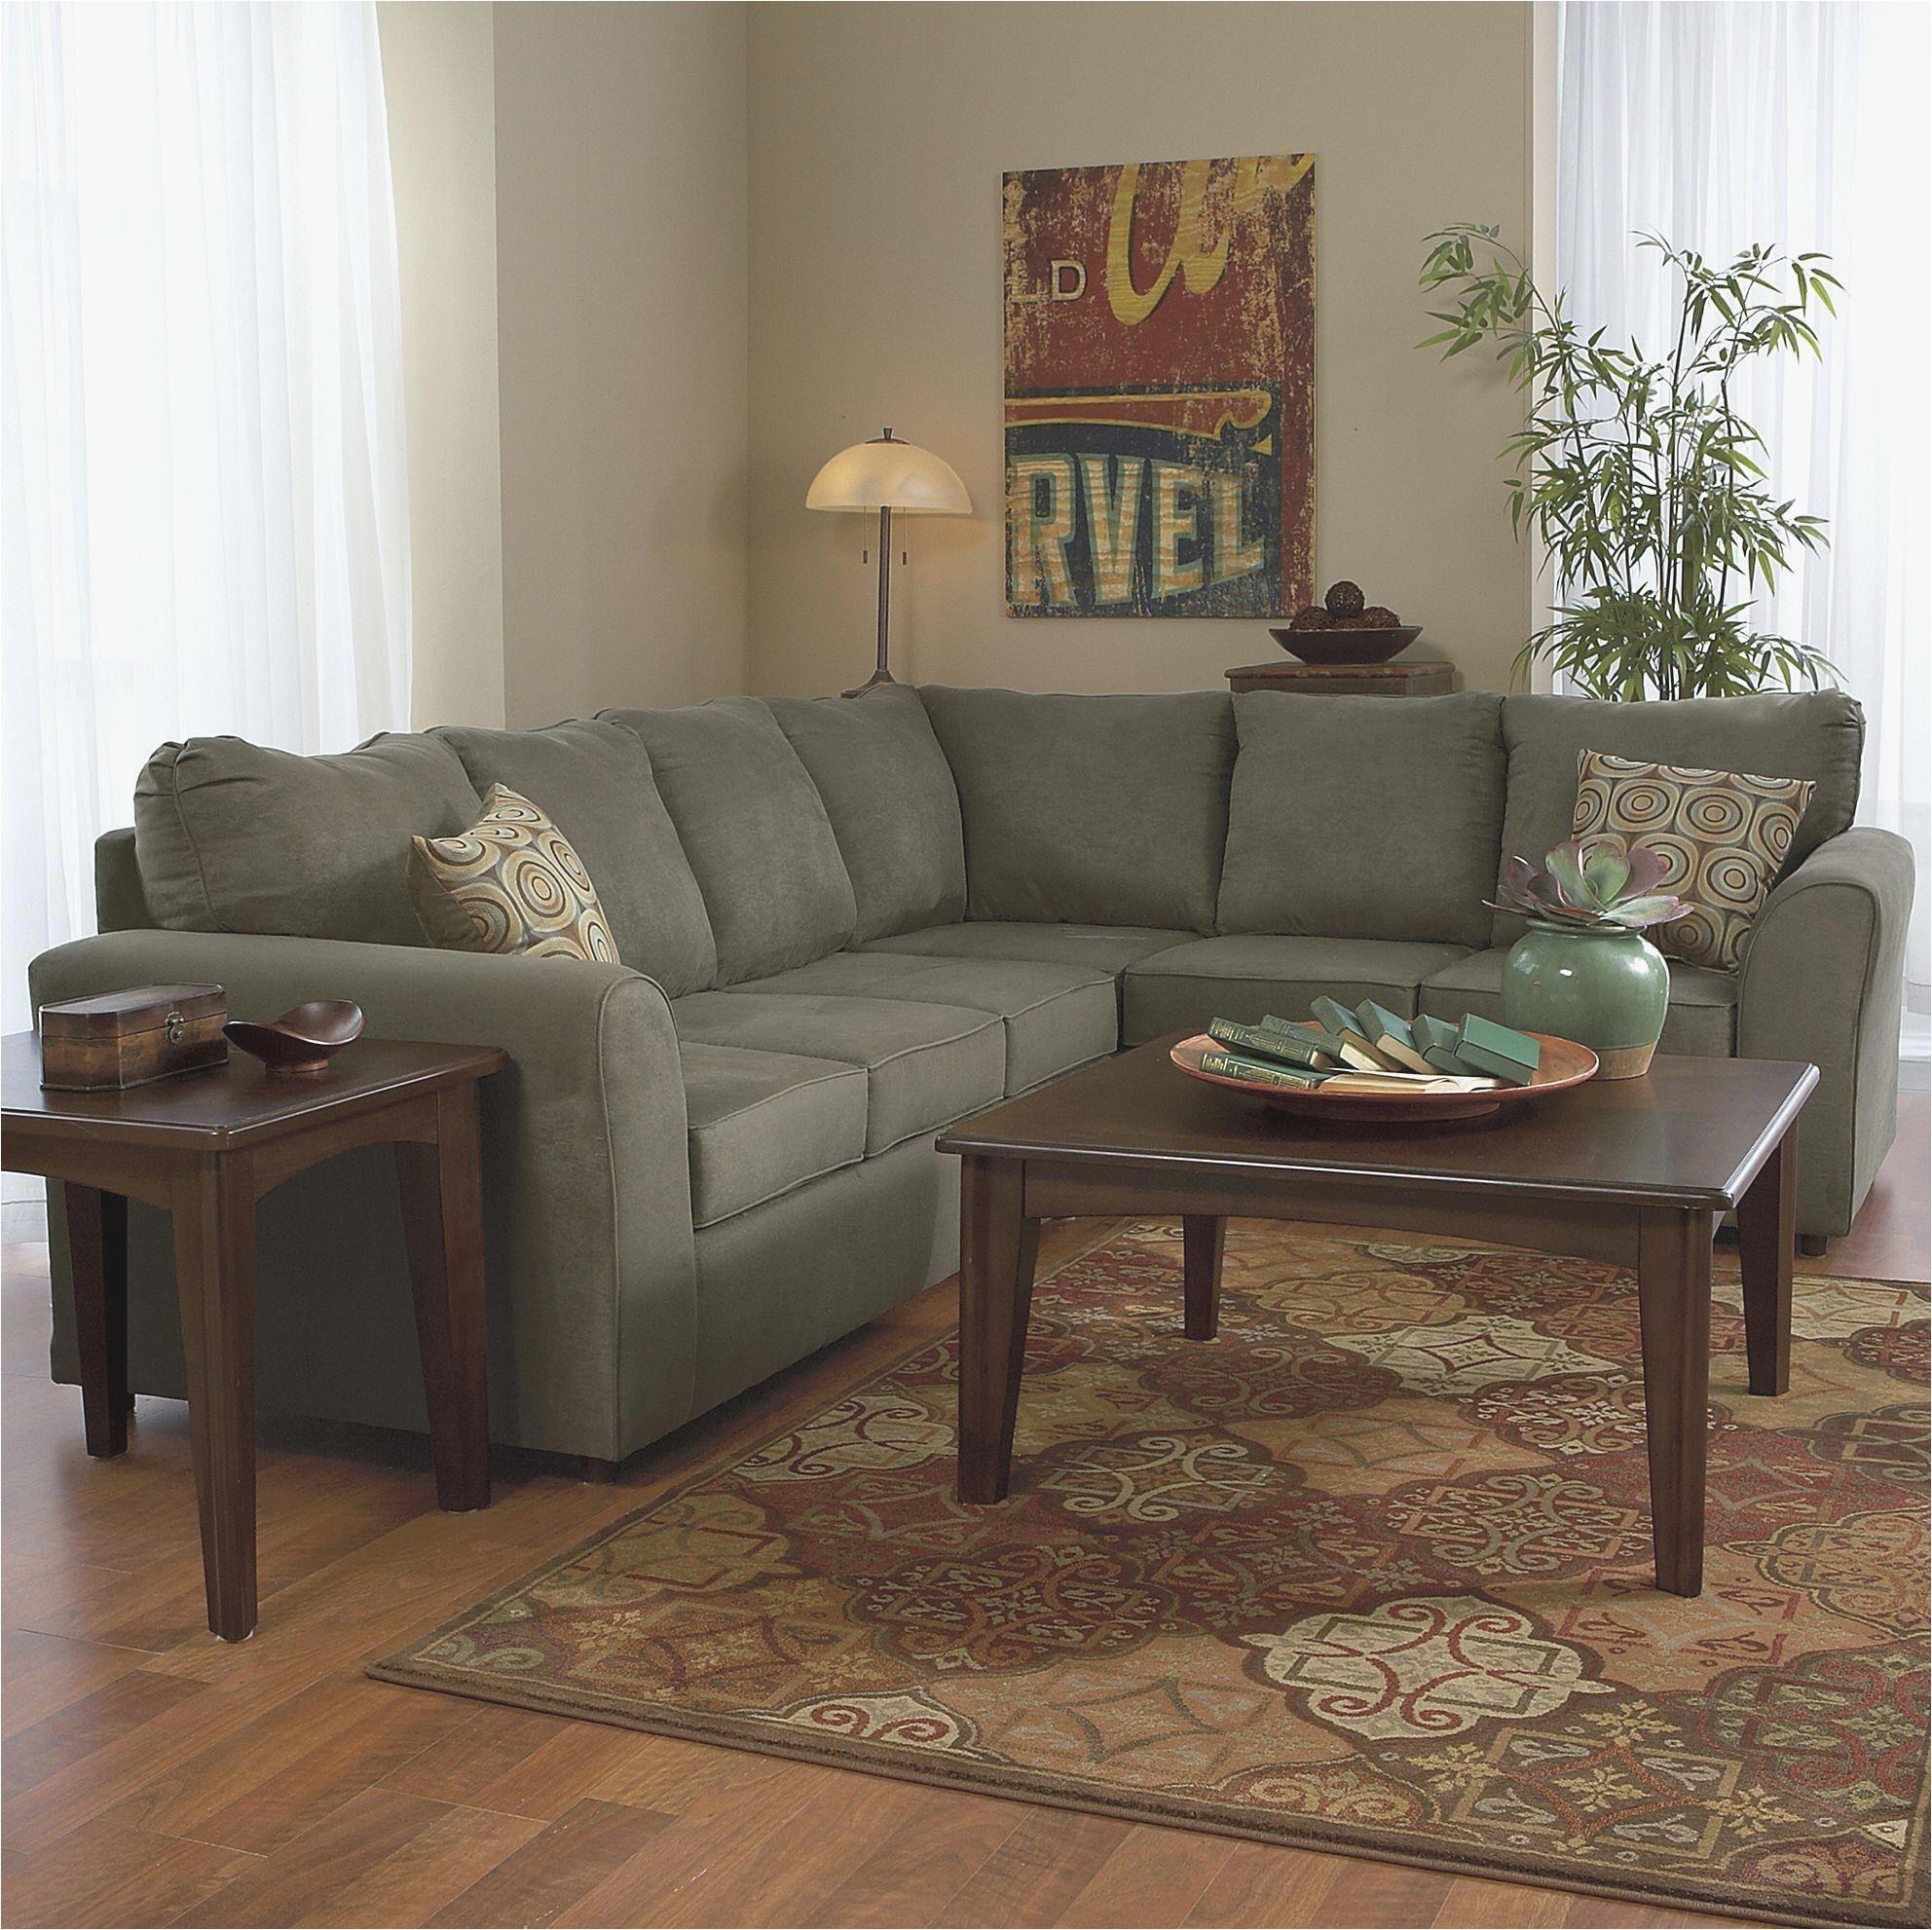 Sunshine Furniture Tulsa Ok Suns Furniture Tulsa Fresh 30 top Patio Furniture Line Ideas